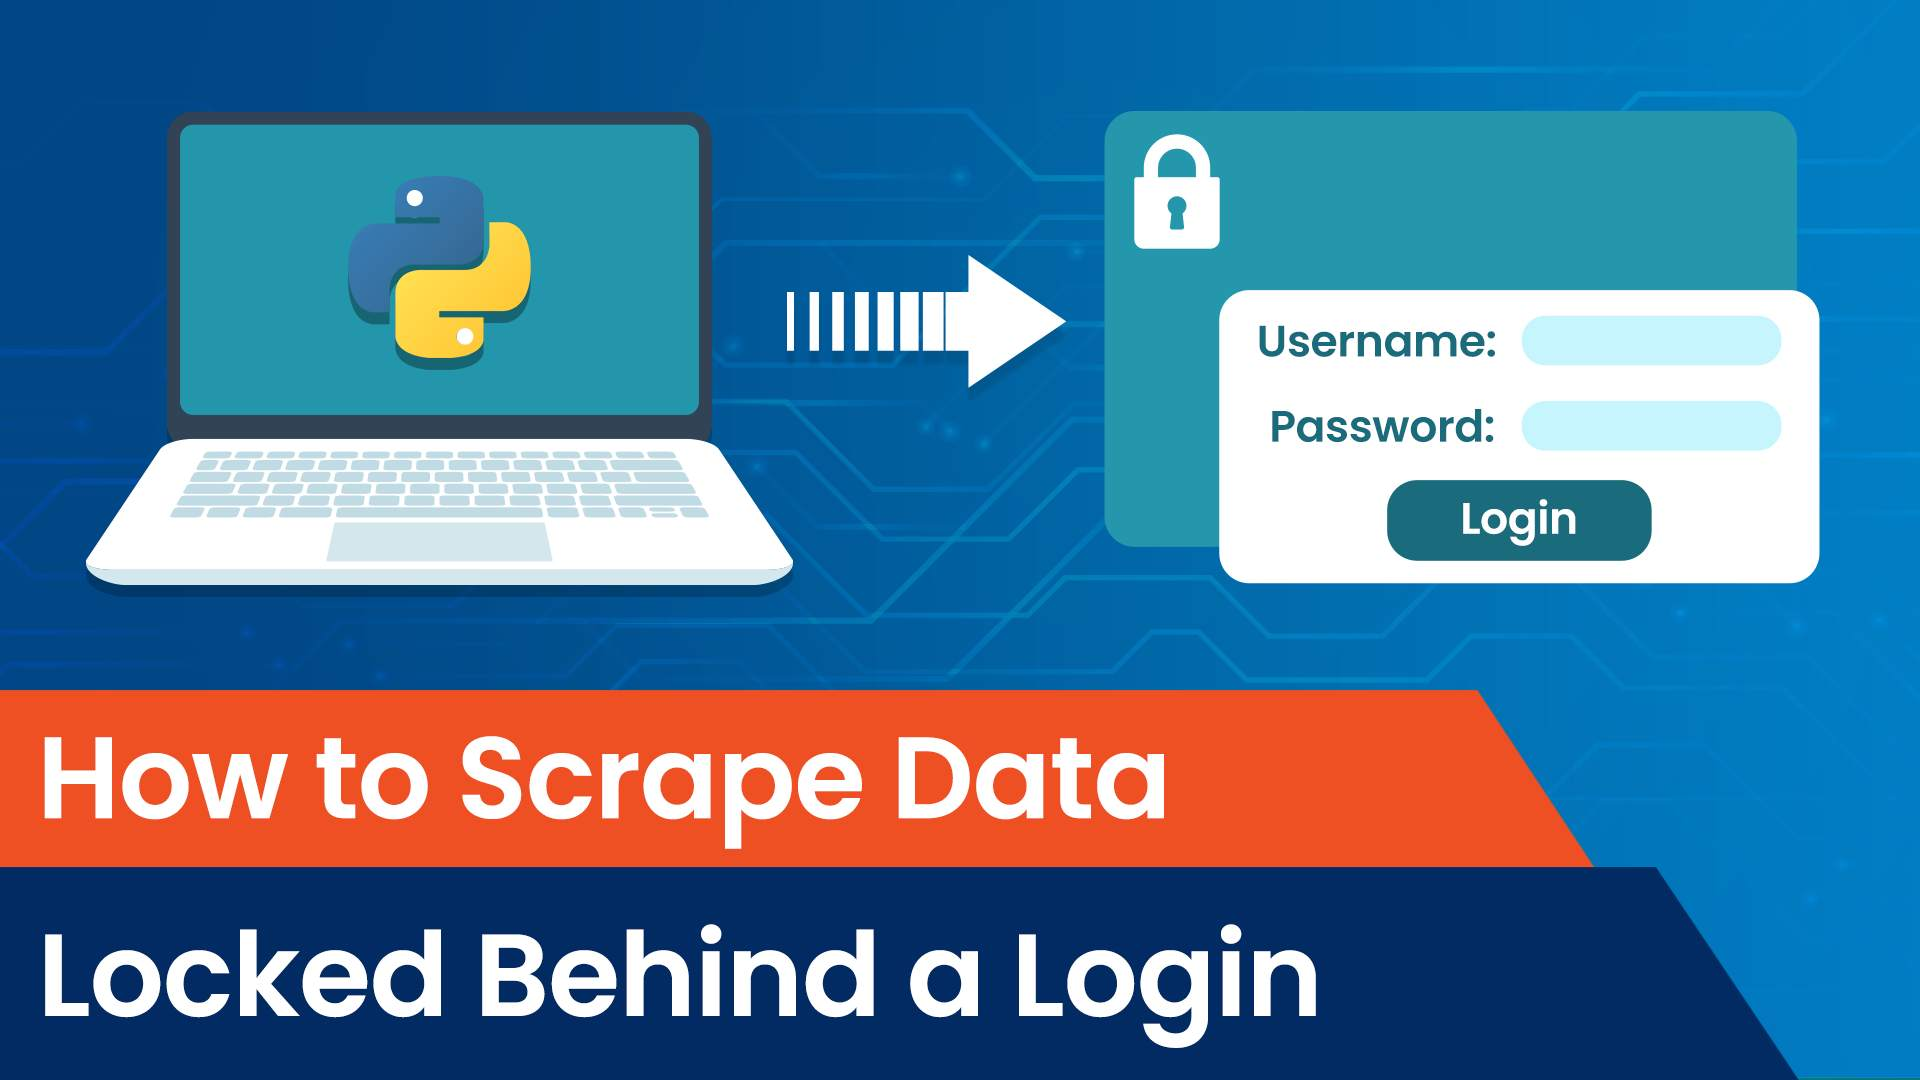 How To Scrape Data Locked Behind A Login?